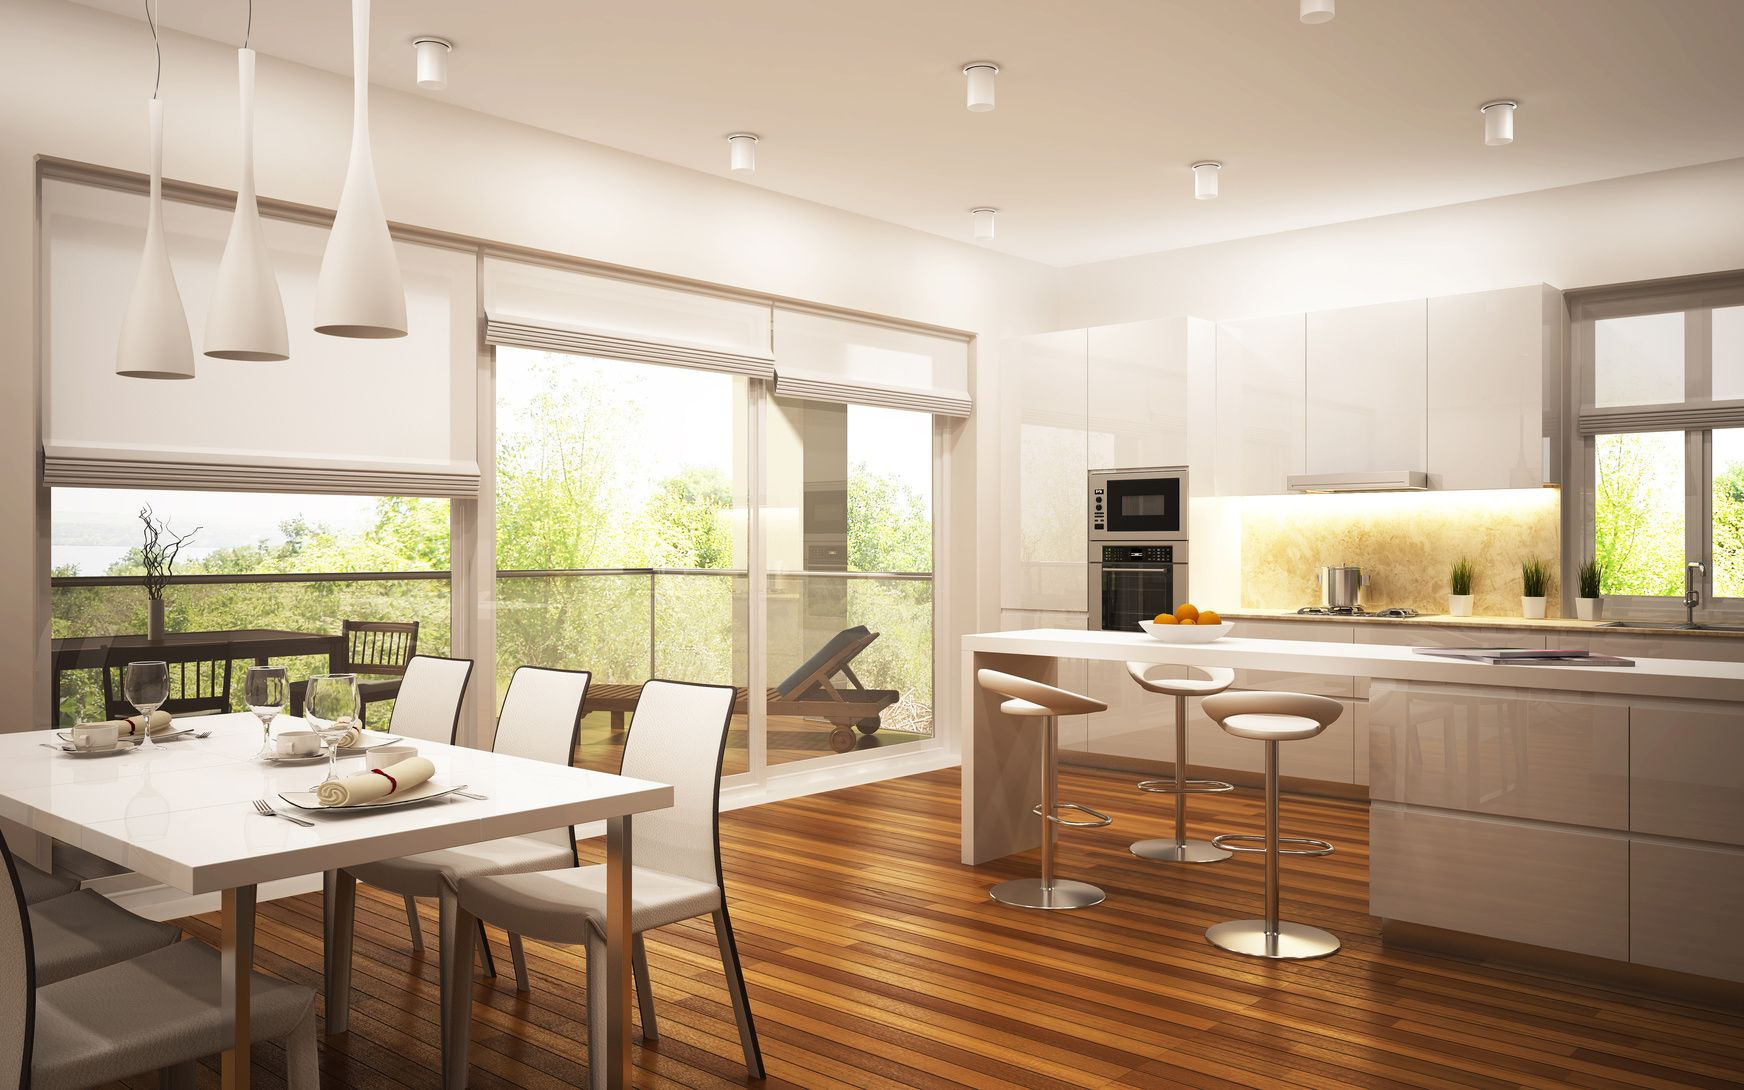 lampade sospese | bram_kitchen lighting in 2018 | Pinterest | Cucine ...